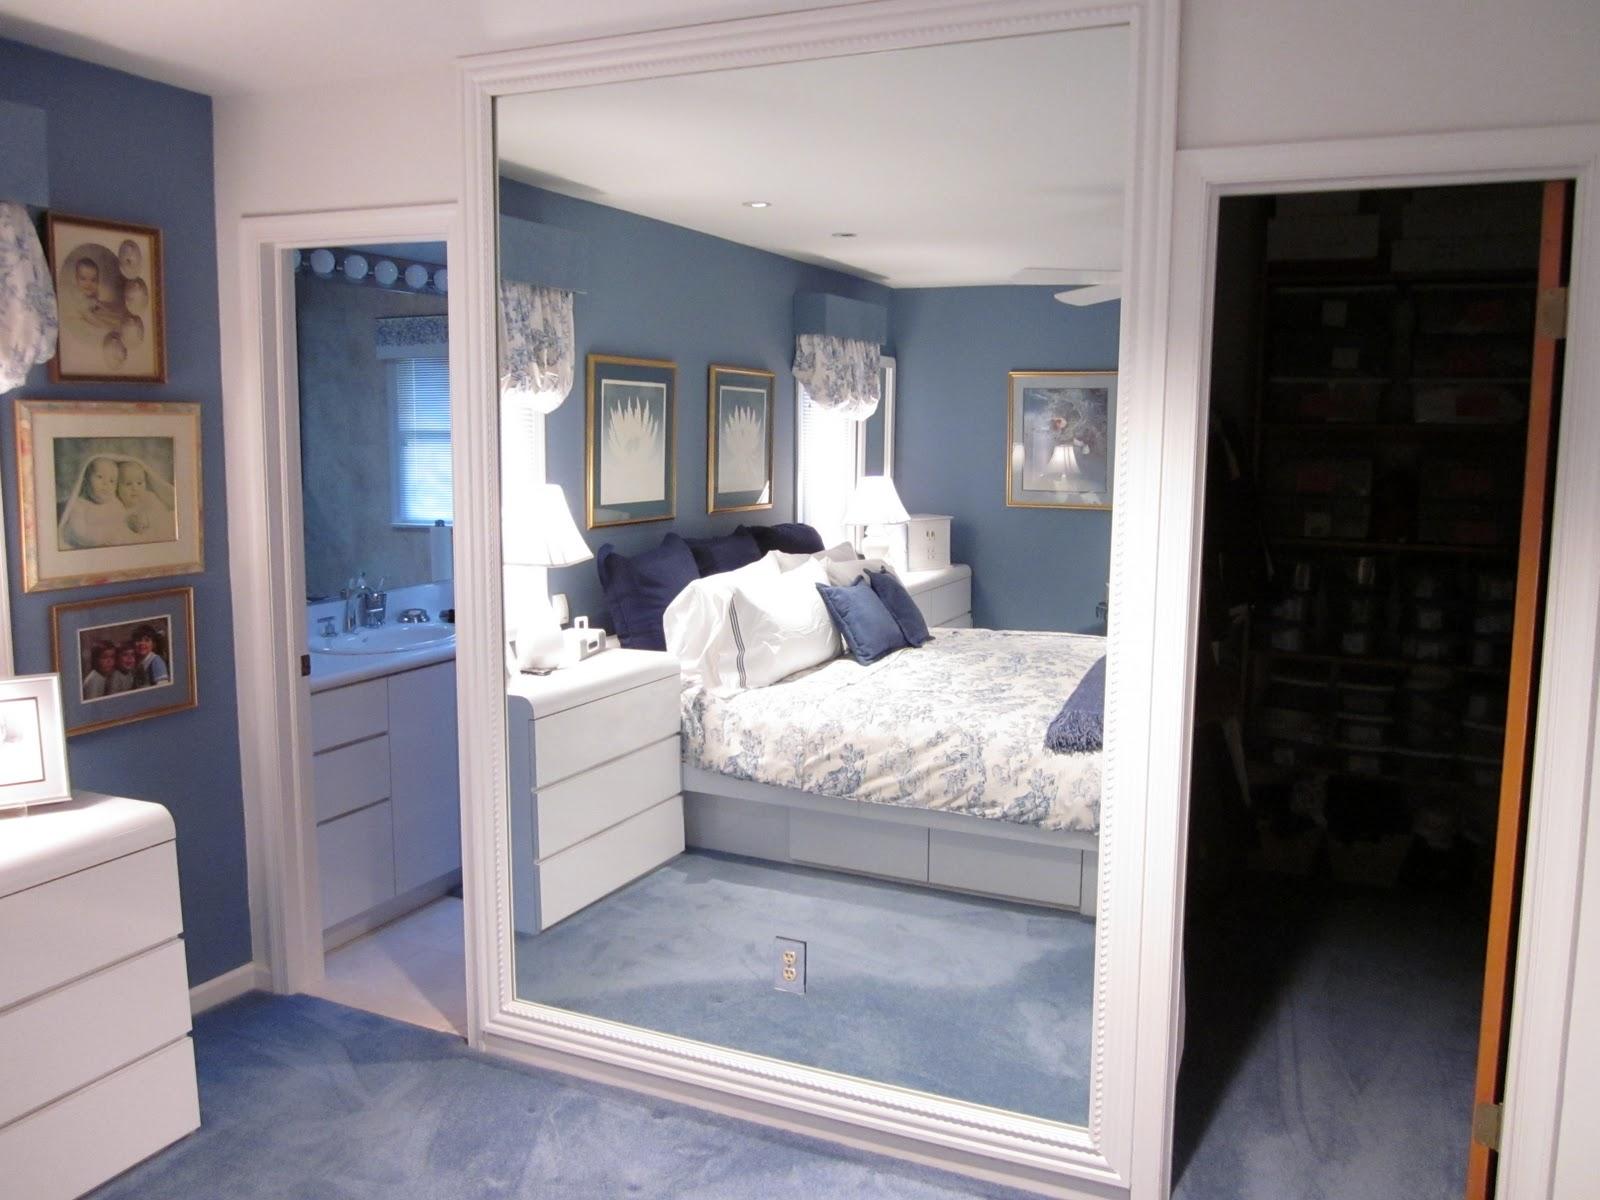 DIY by Design: Framing a Large Mirror